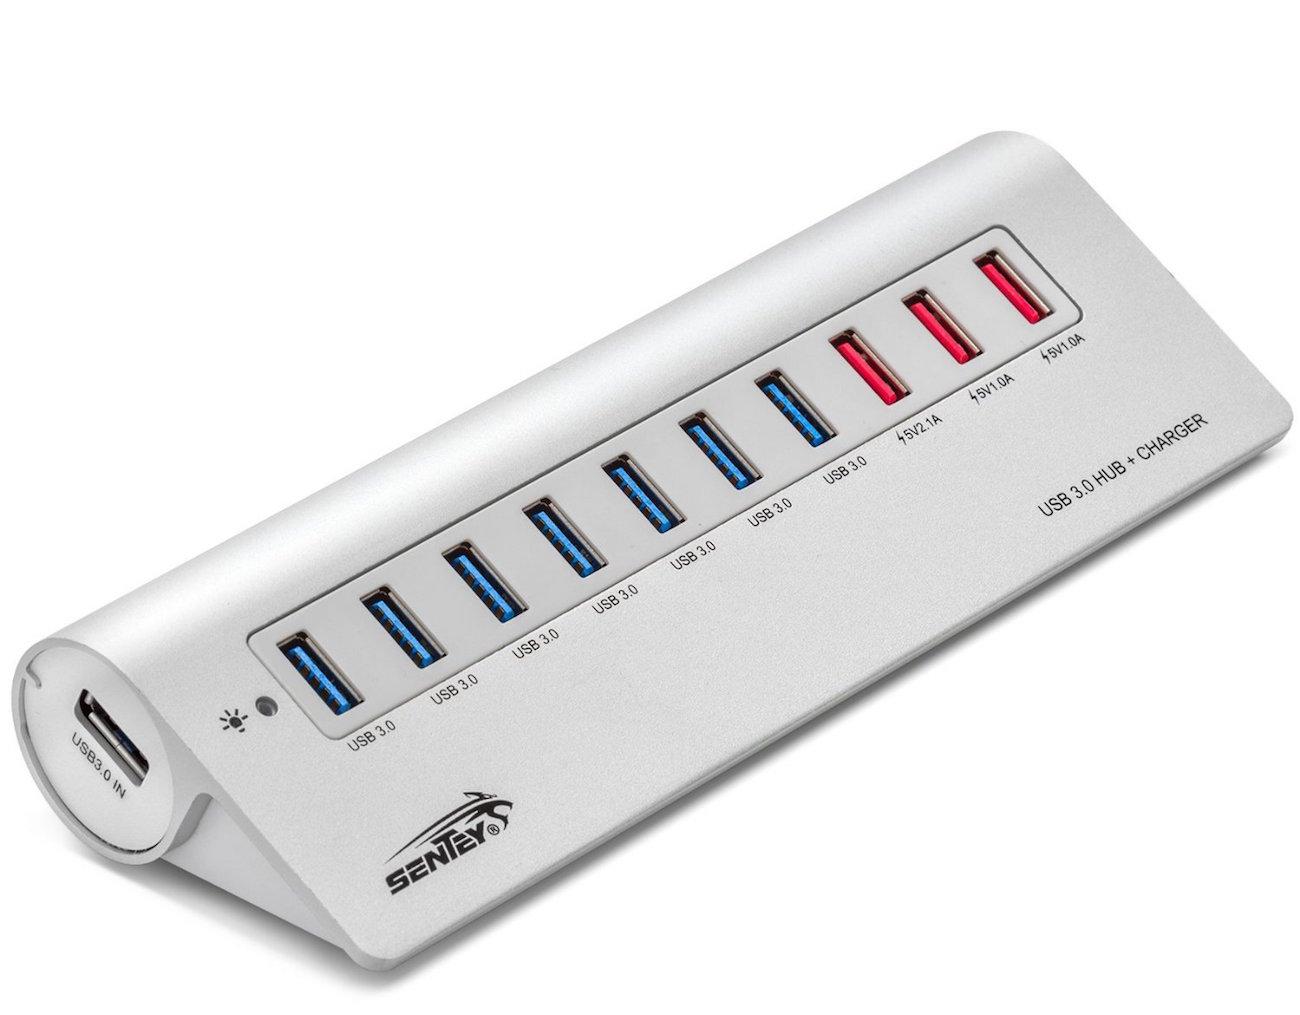 Sentey Aluminium 10 Ports Usb 3 0 Hub 187 Gadget Flow